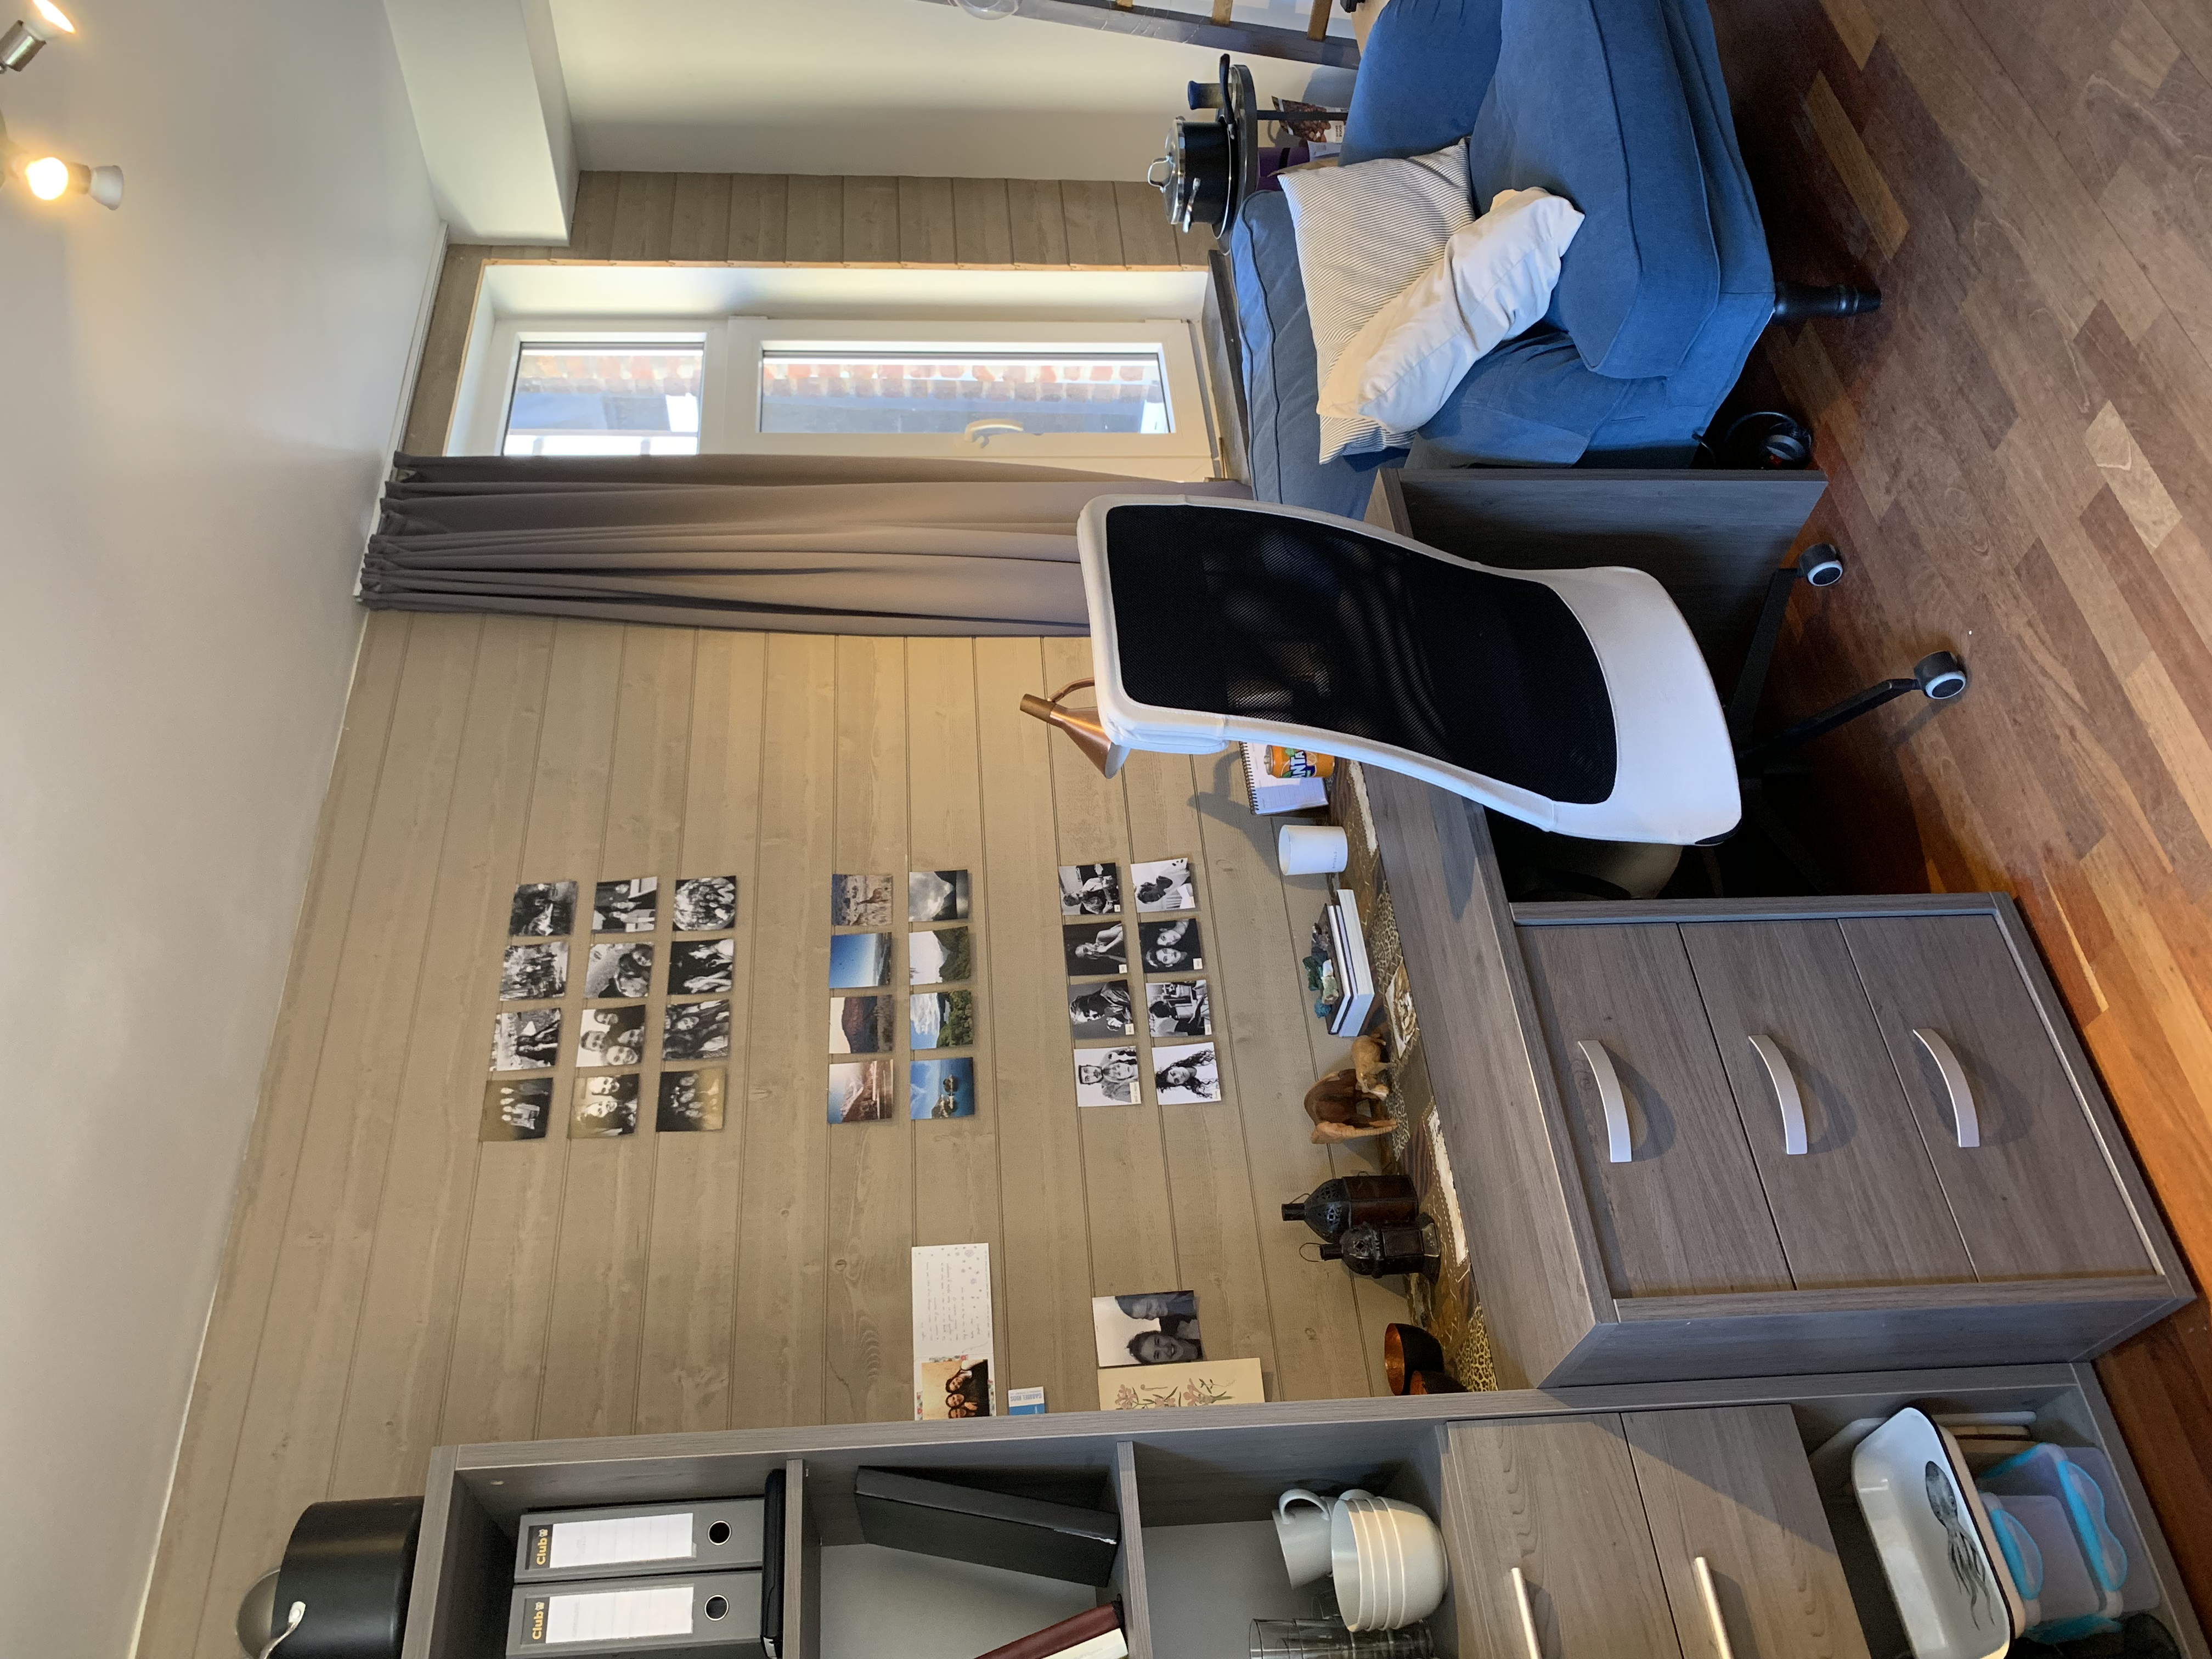 DB5-0101 - boekenrek, bureau, zetel en r